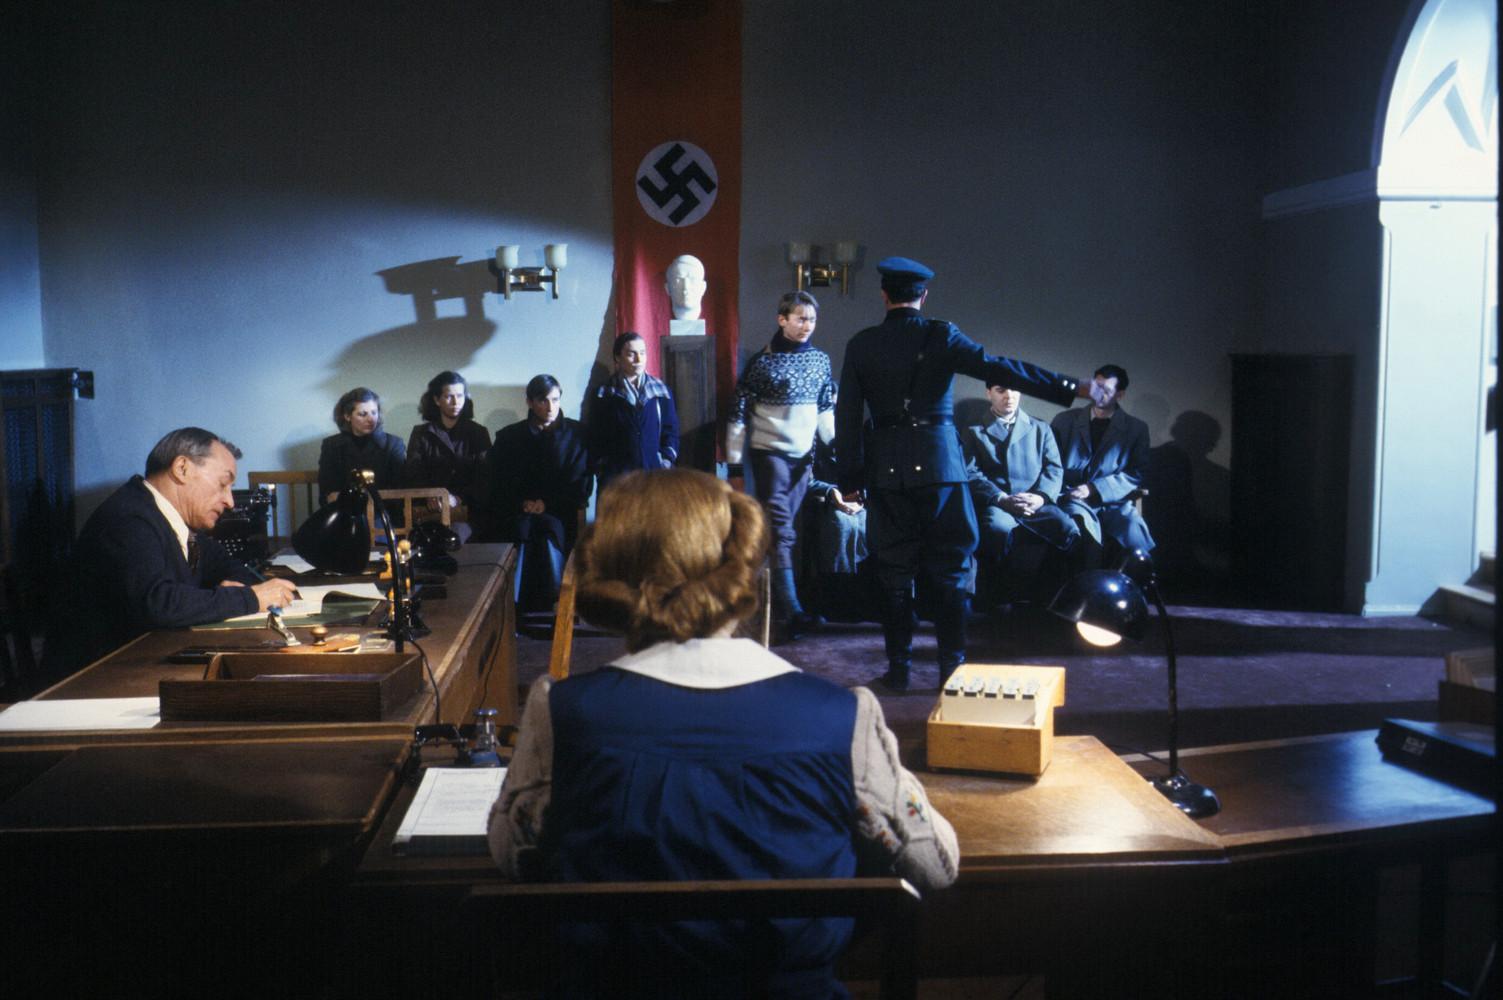 Five courtroom.jpeg